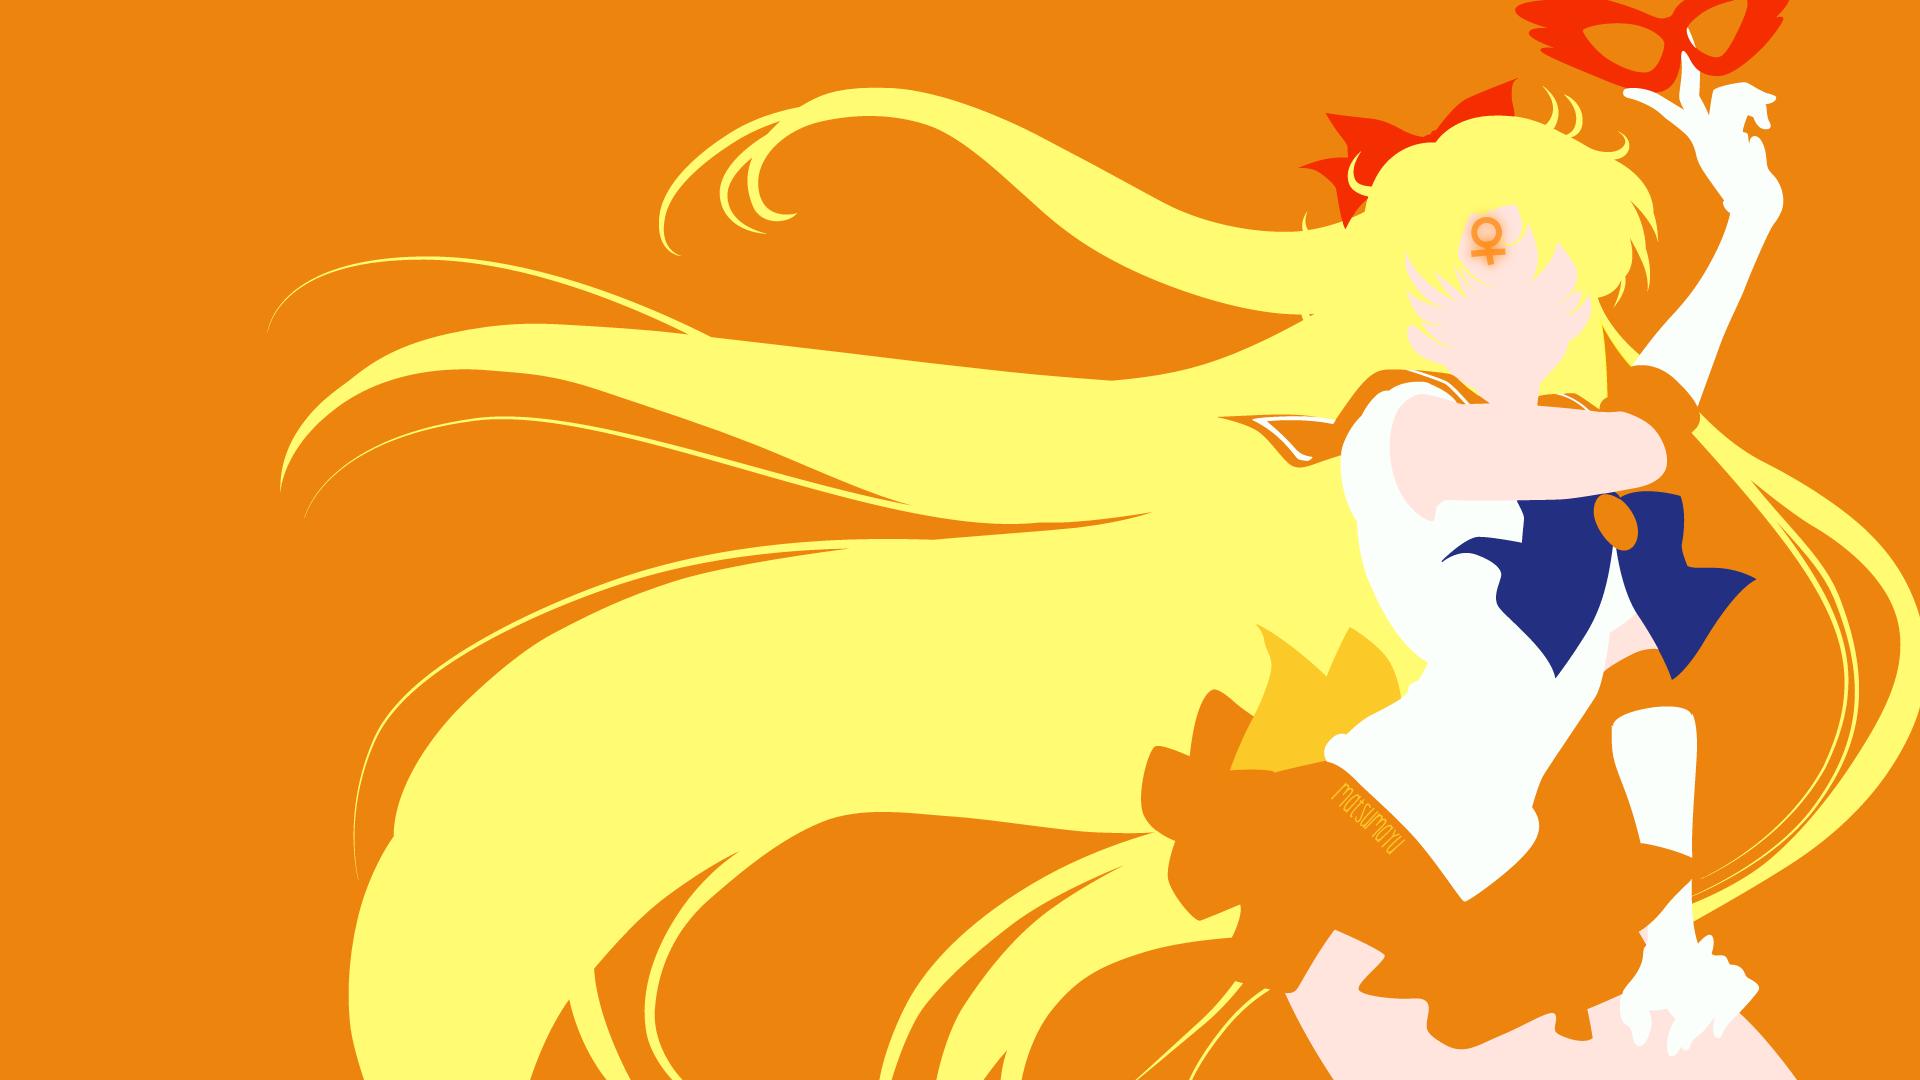 Sailor Moon Crystal Hd Wallpaper Background Image 1920x1080